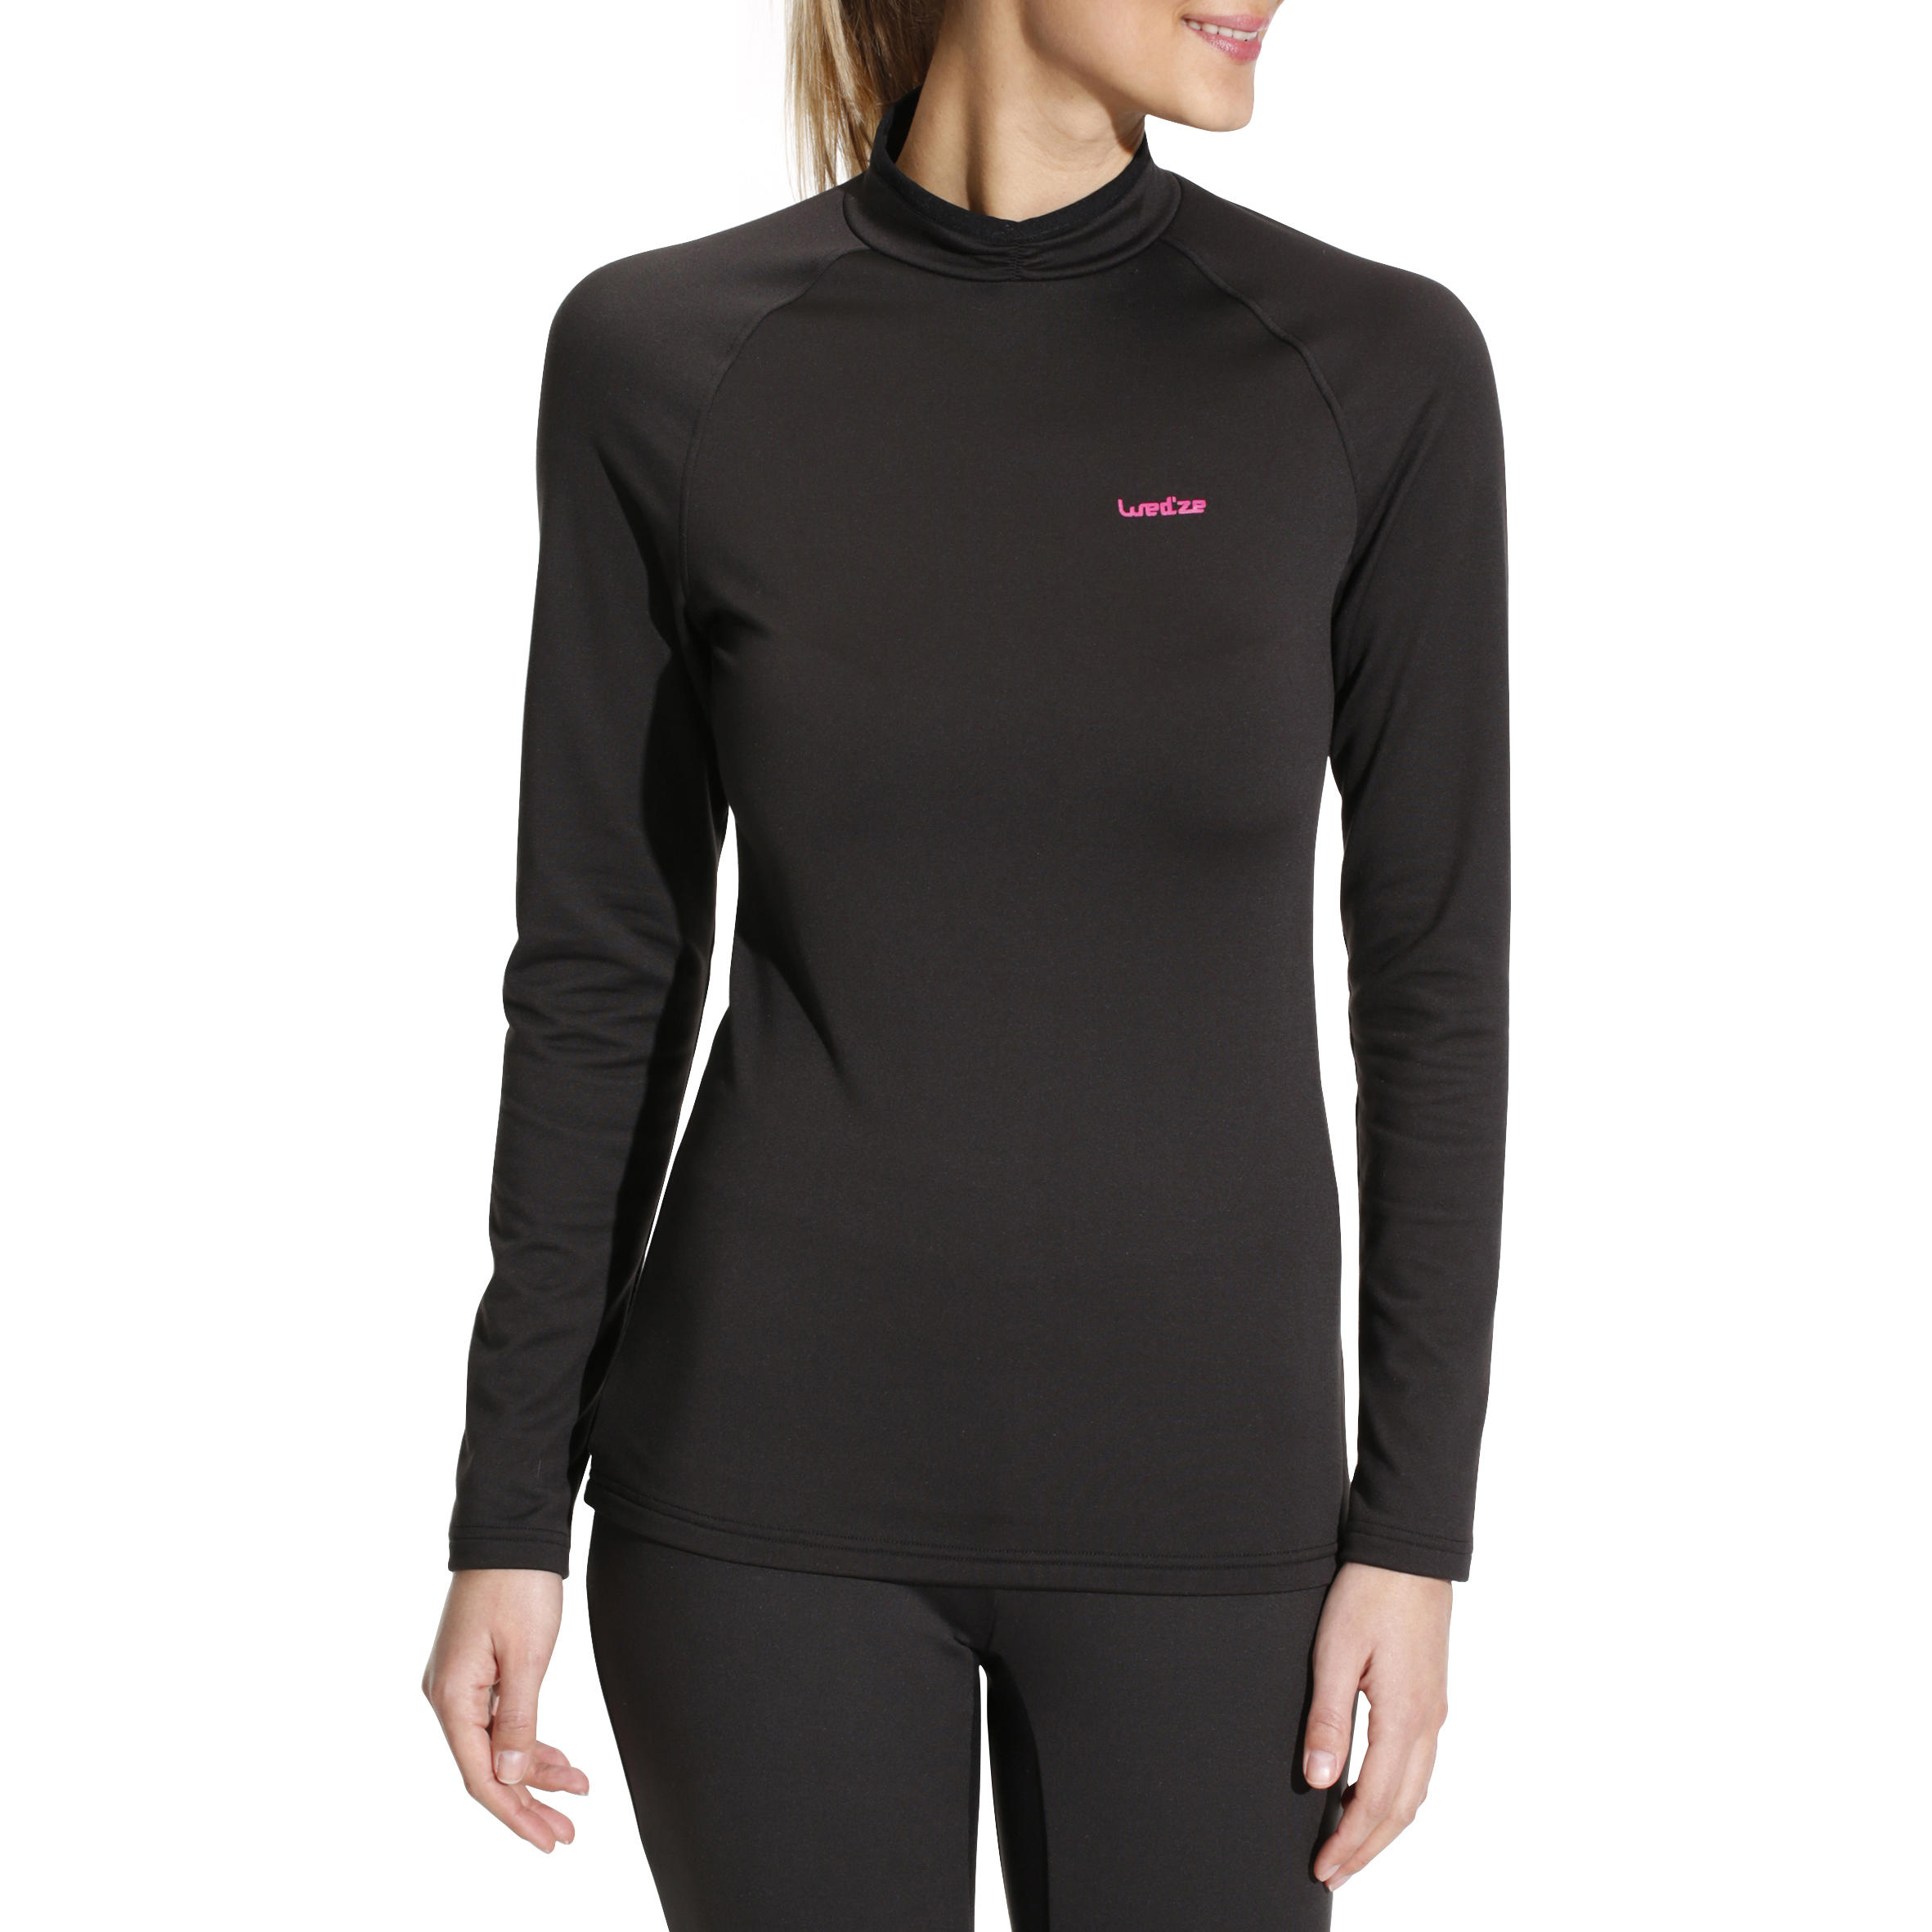 Freshwarm Women's Ski Base Layer Top - Black